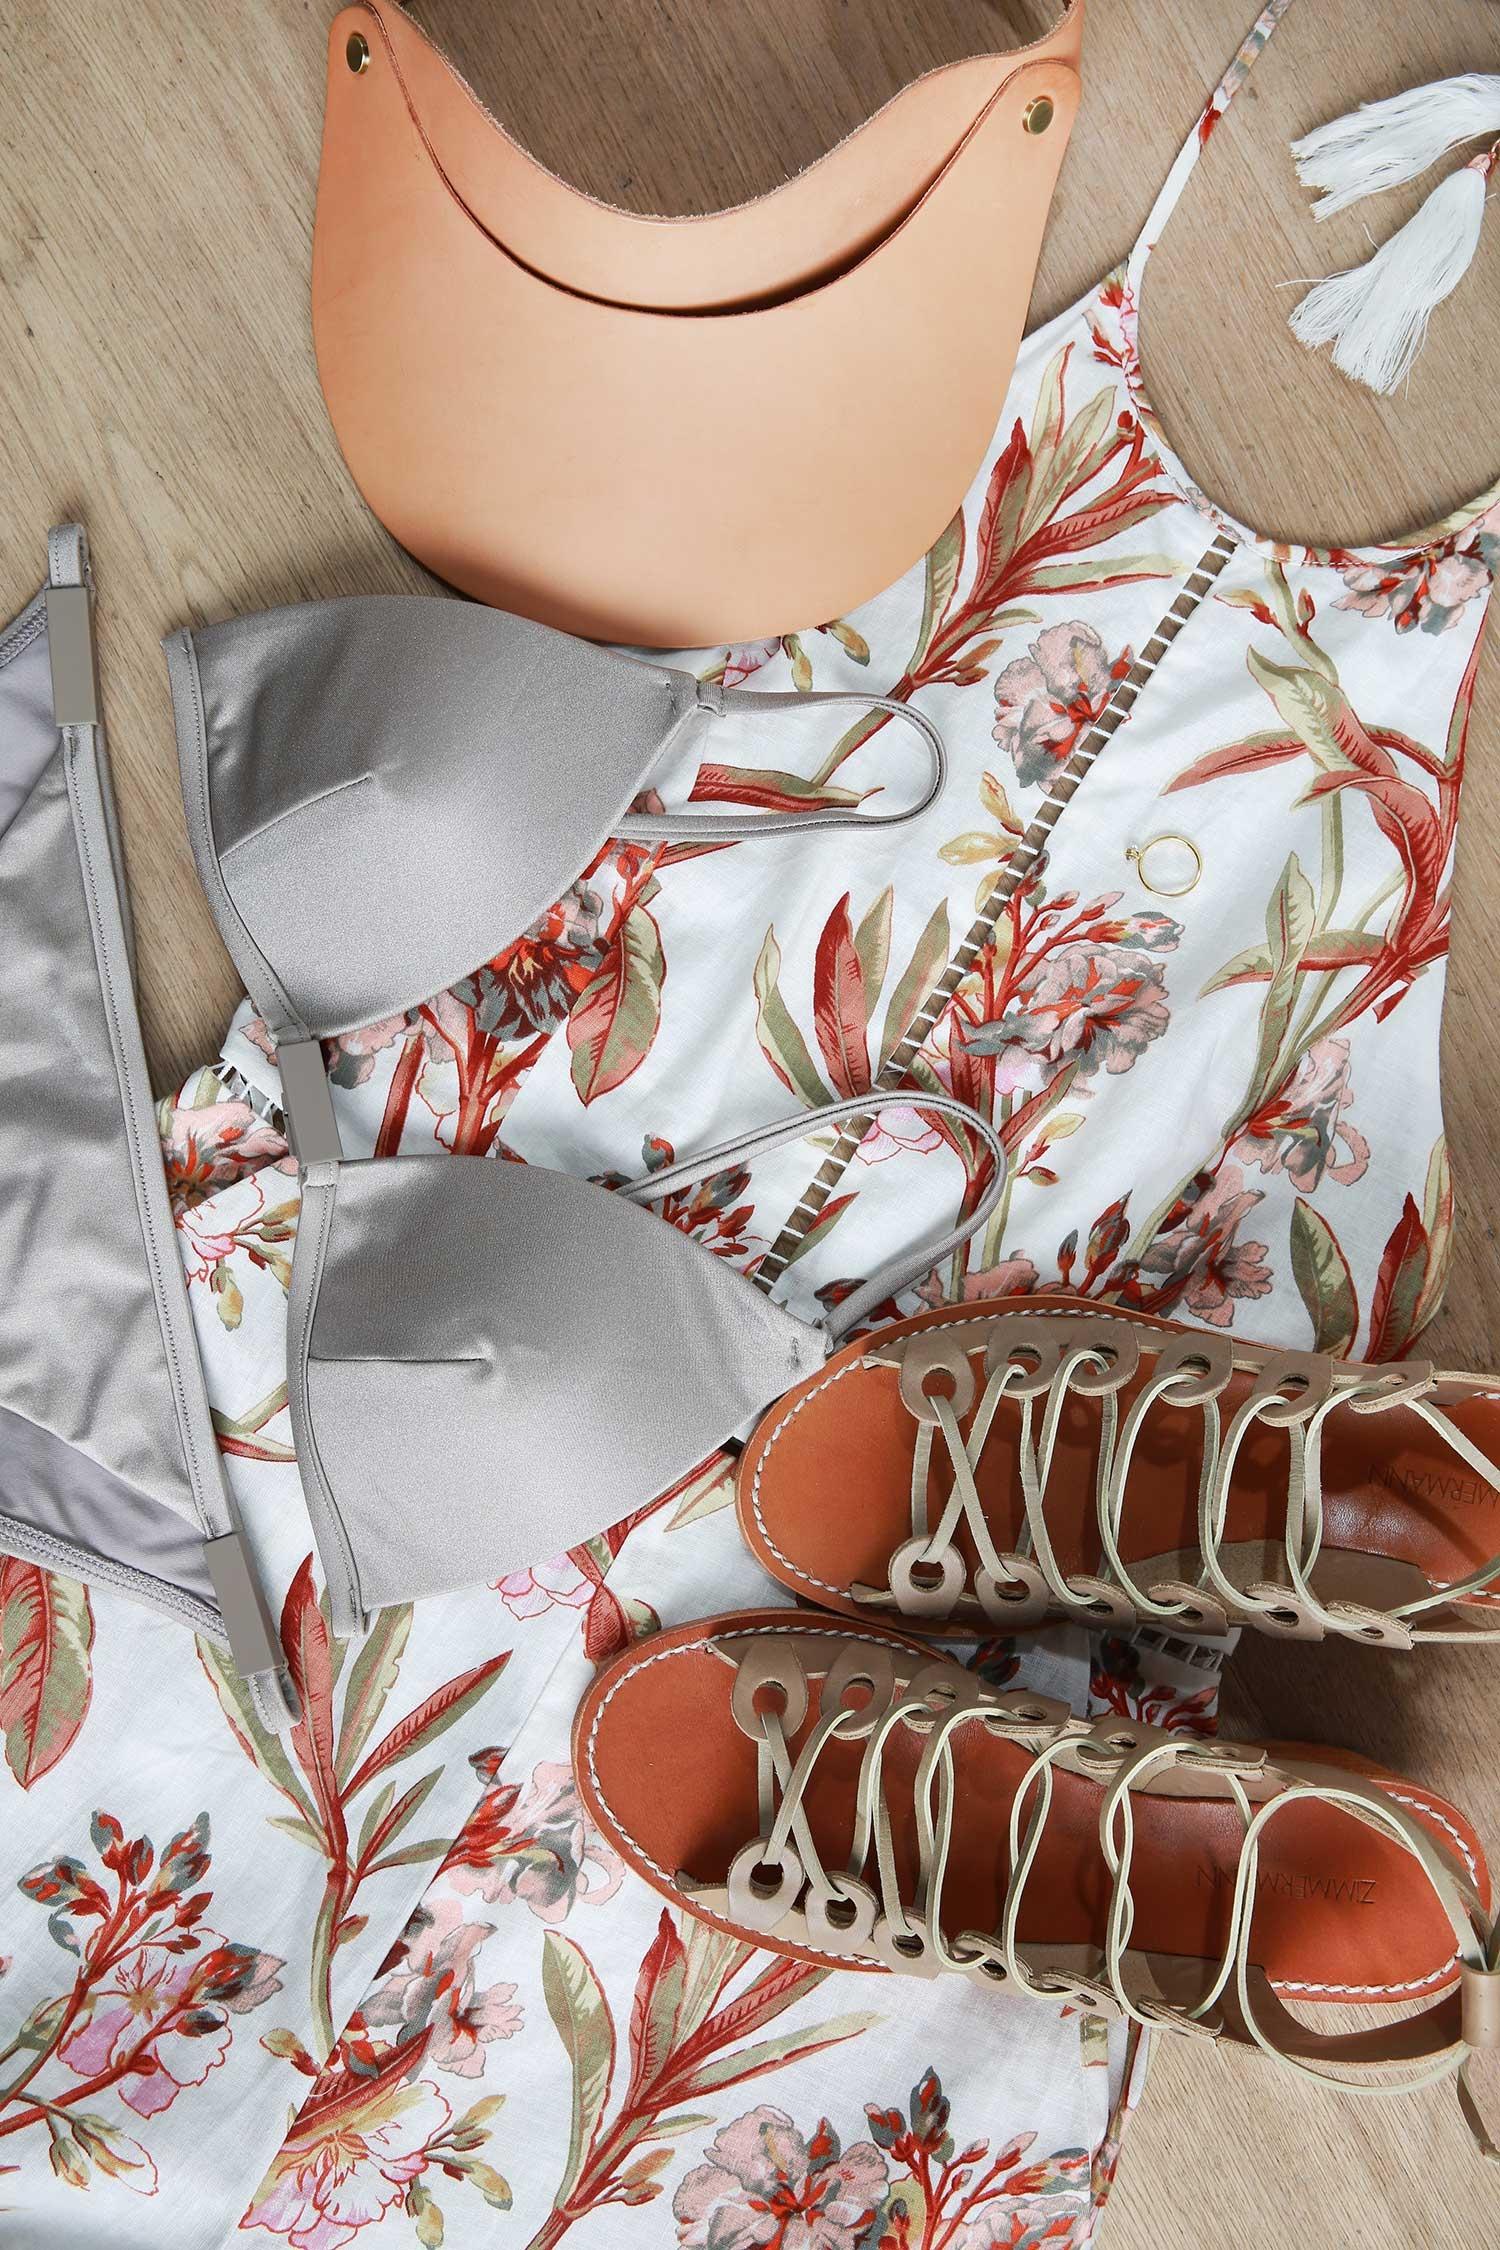 Zimmermann swimwear, shoes and hat